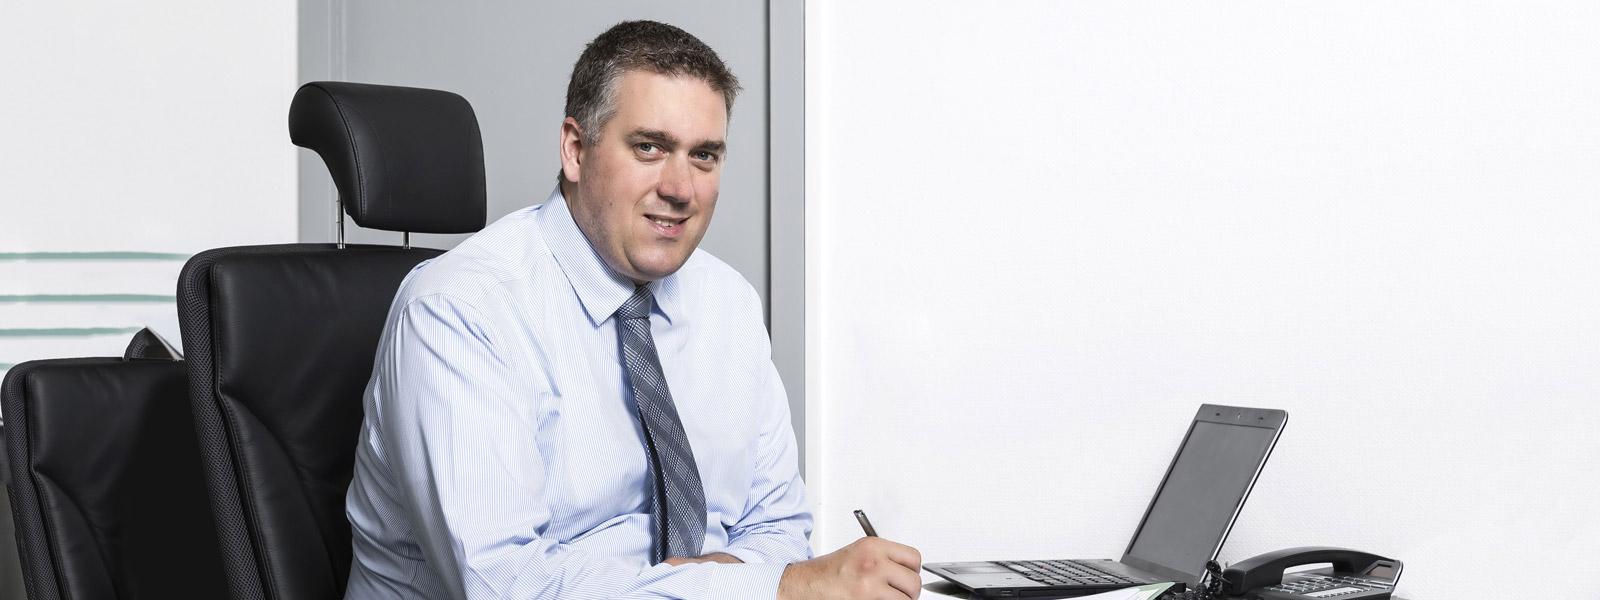 Kanzlei Nils Weigand Rechtsanwalt